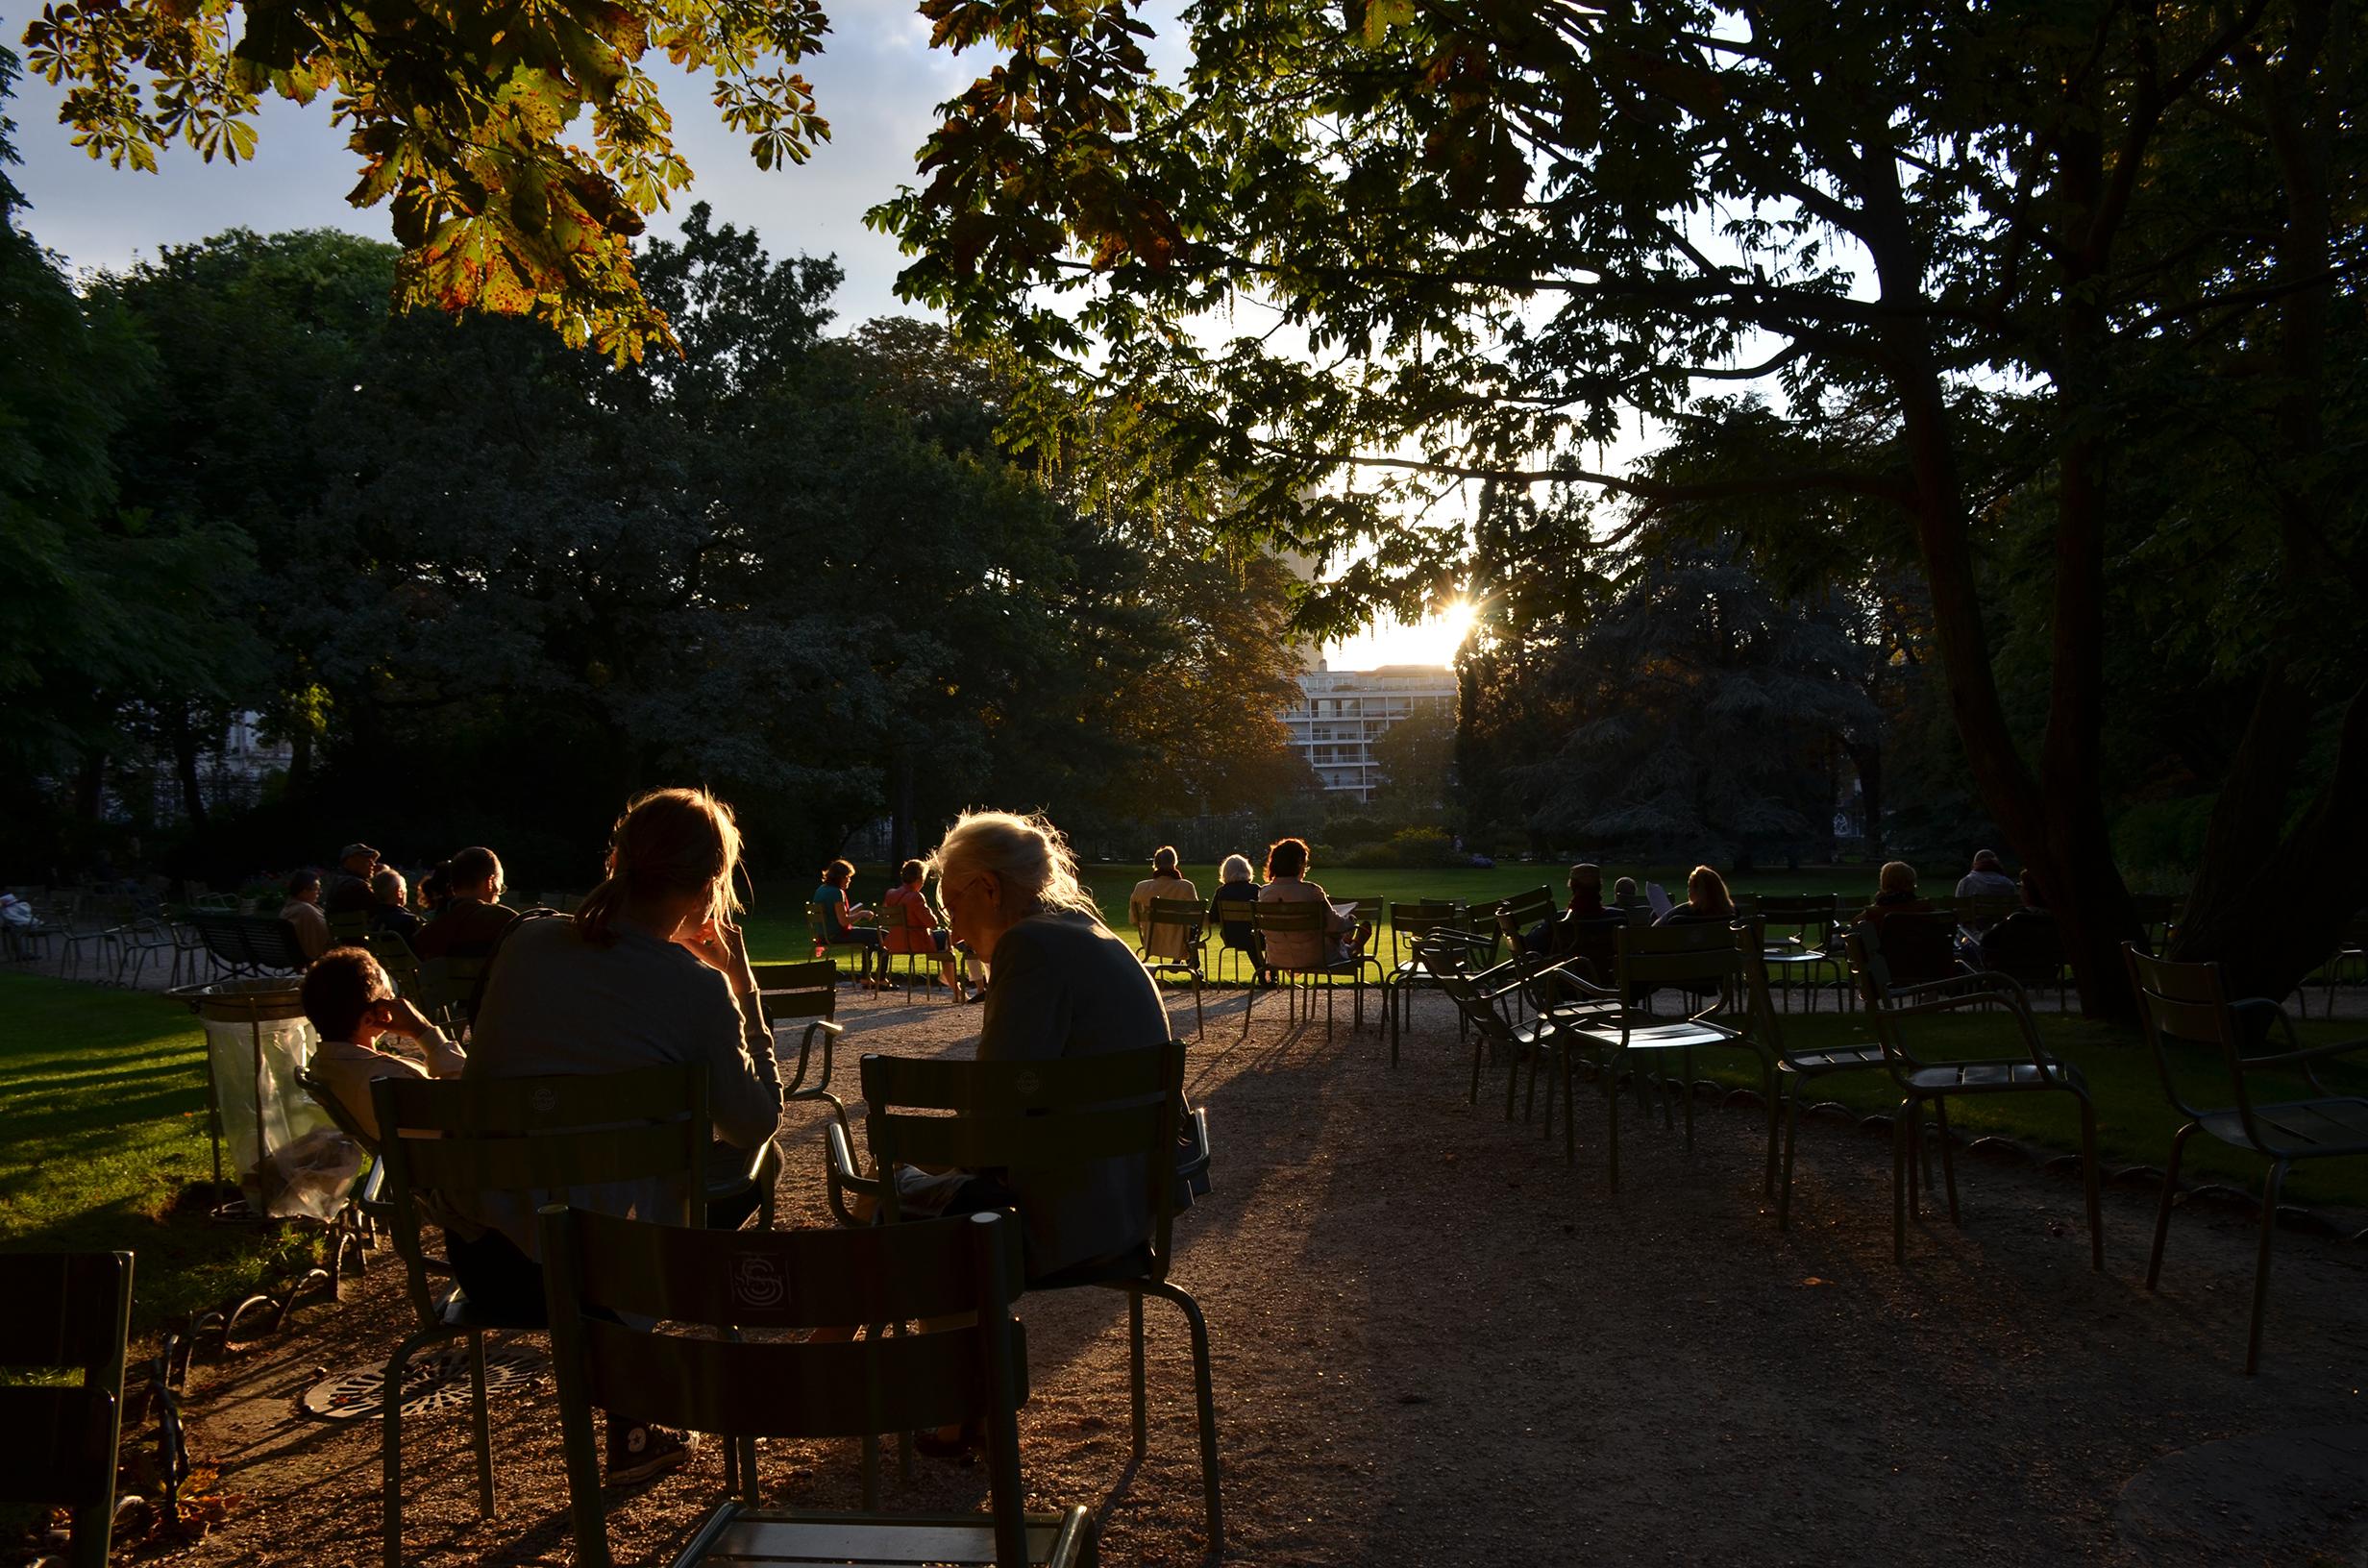 Paris_Luxemborg_Gardens.jpg